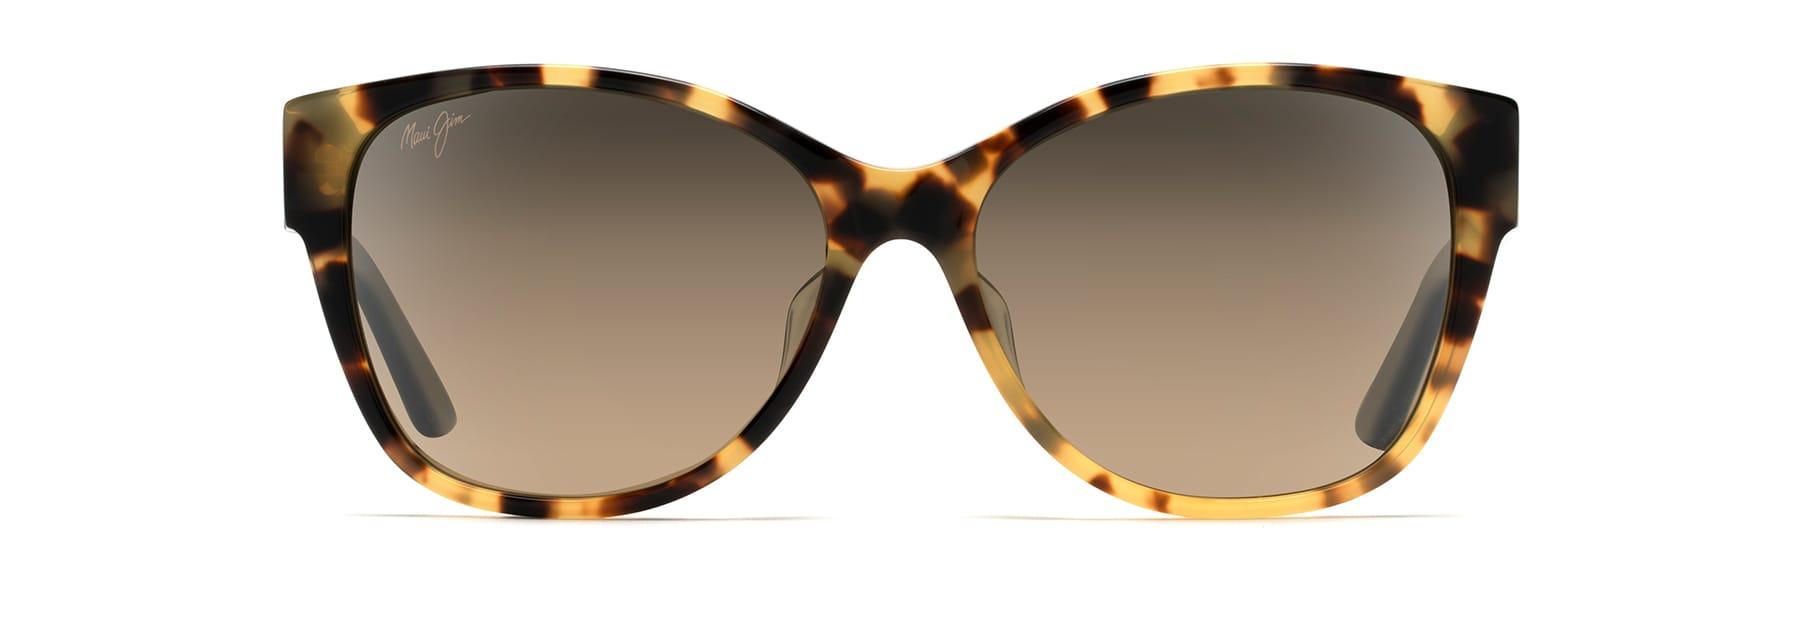 2ae42175d5a Summer Time Polarized Sunglasses